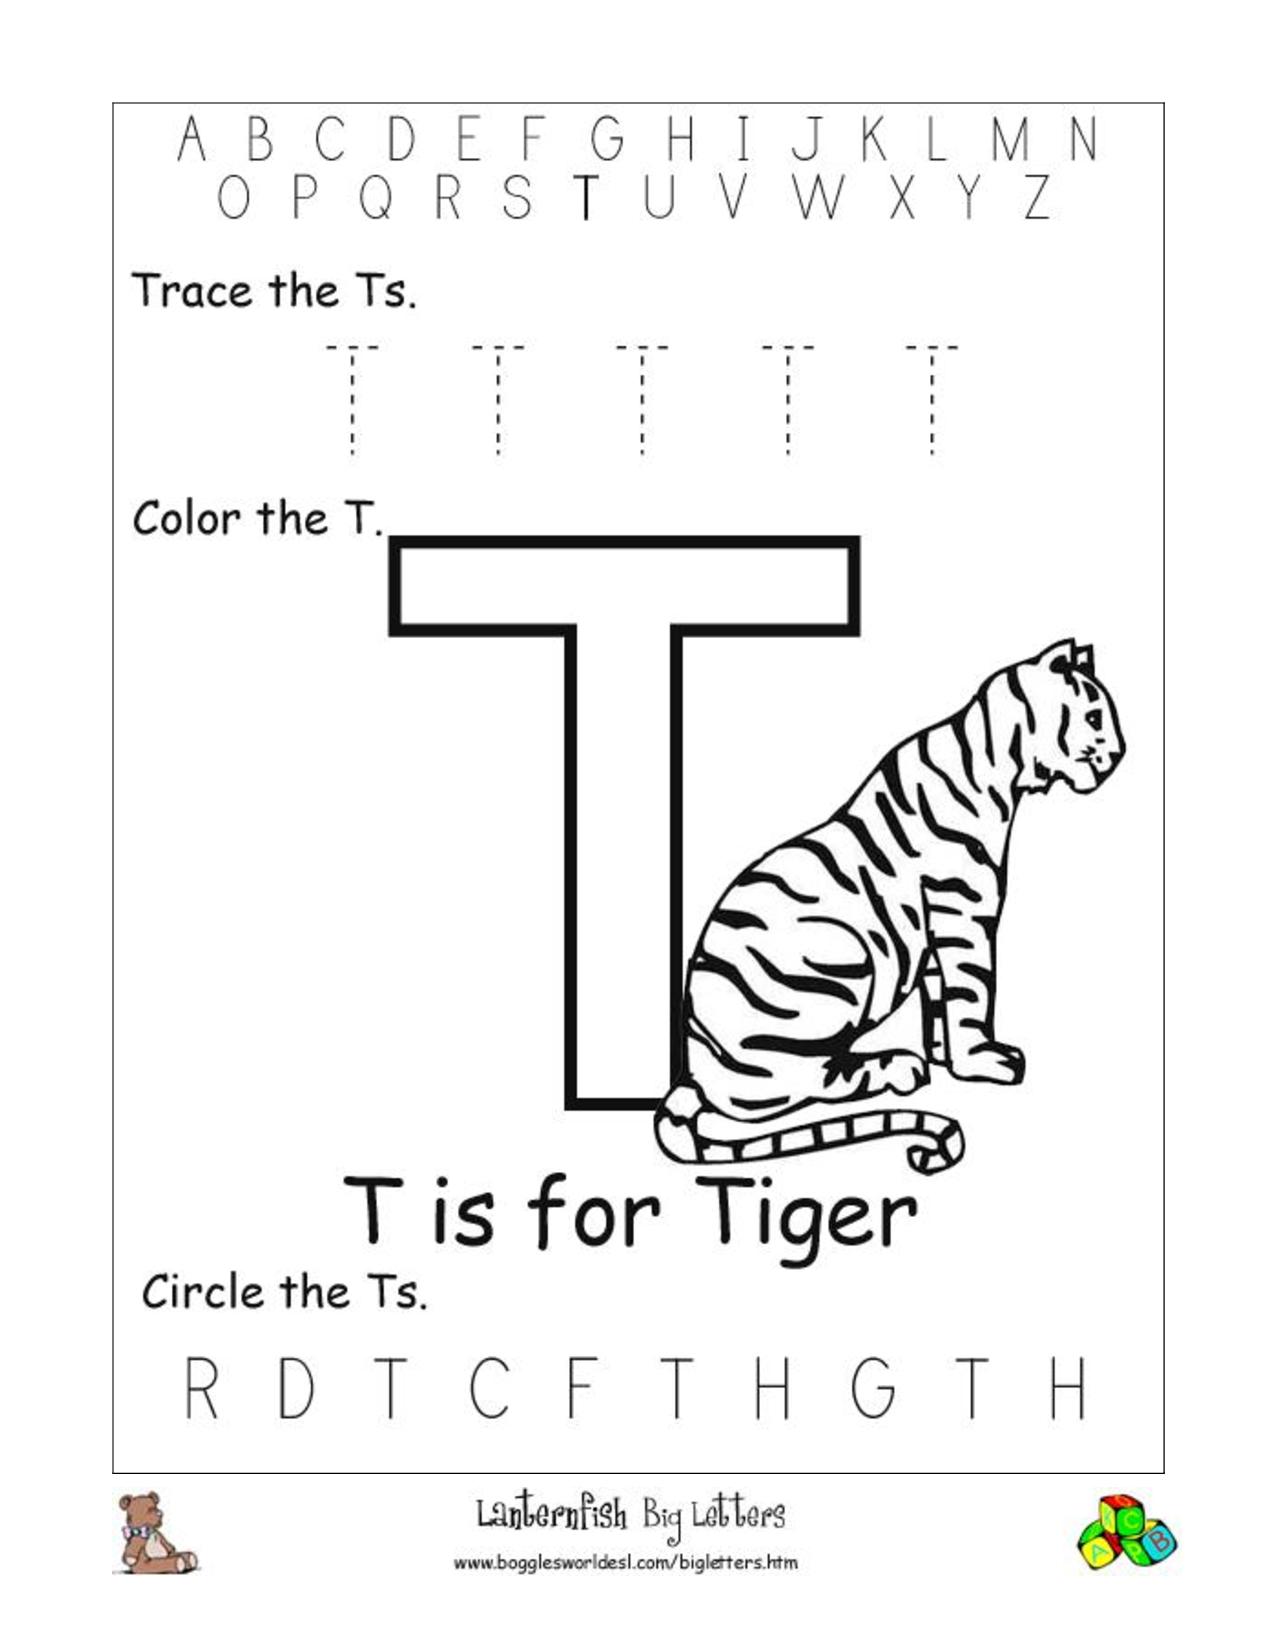 Alphabet Worksheets For Preschoolers | Alphabet Worksheet for Letter T Worksheets Prek